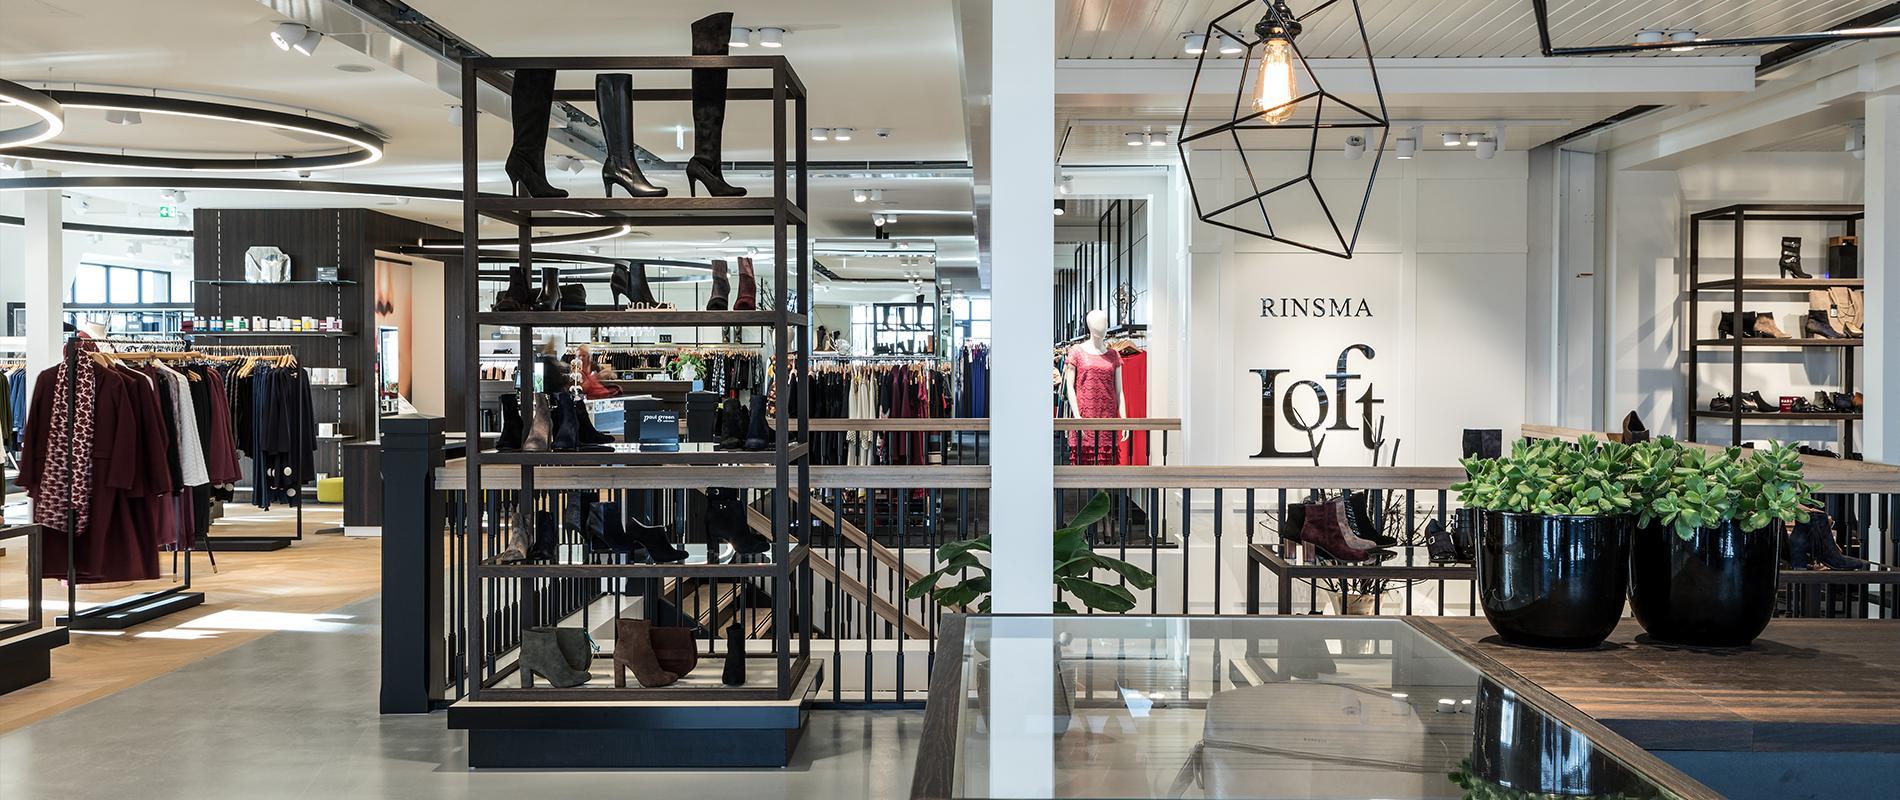 ZIJ van Rinsma, Gorredijk | Binnenbrand brand environment design